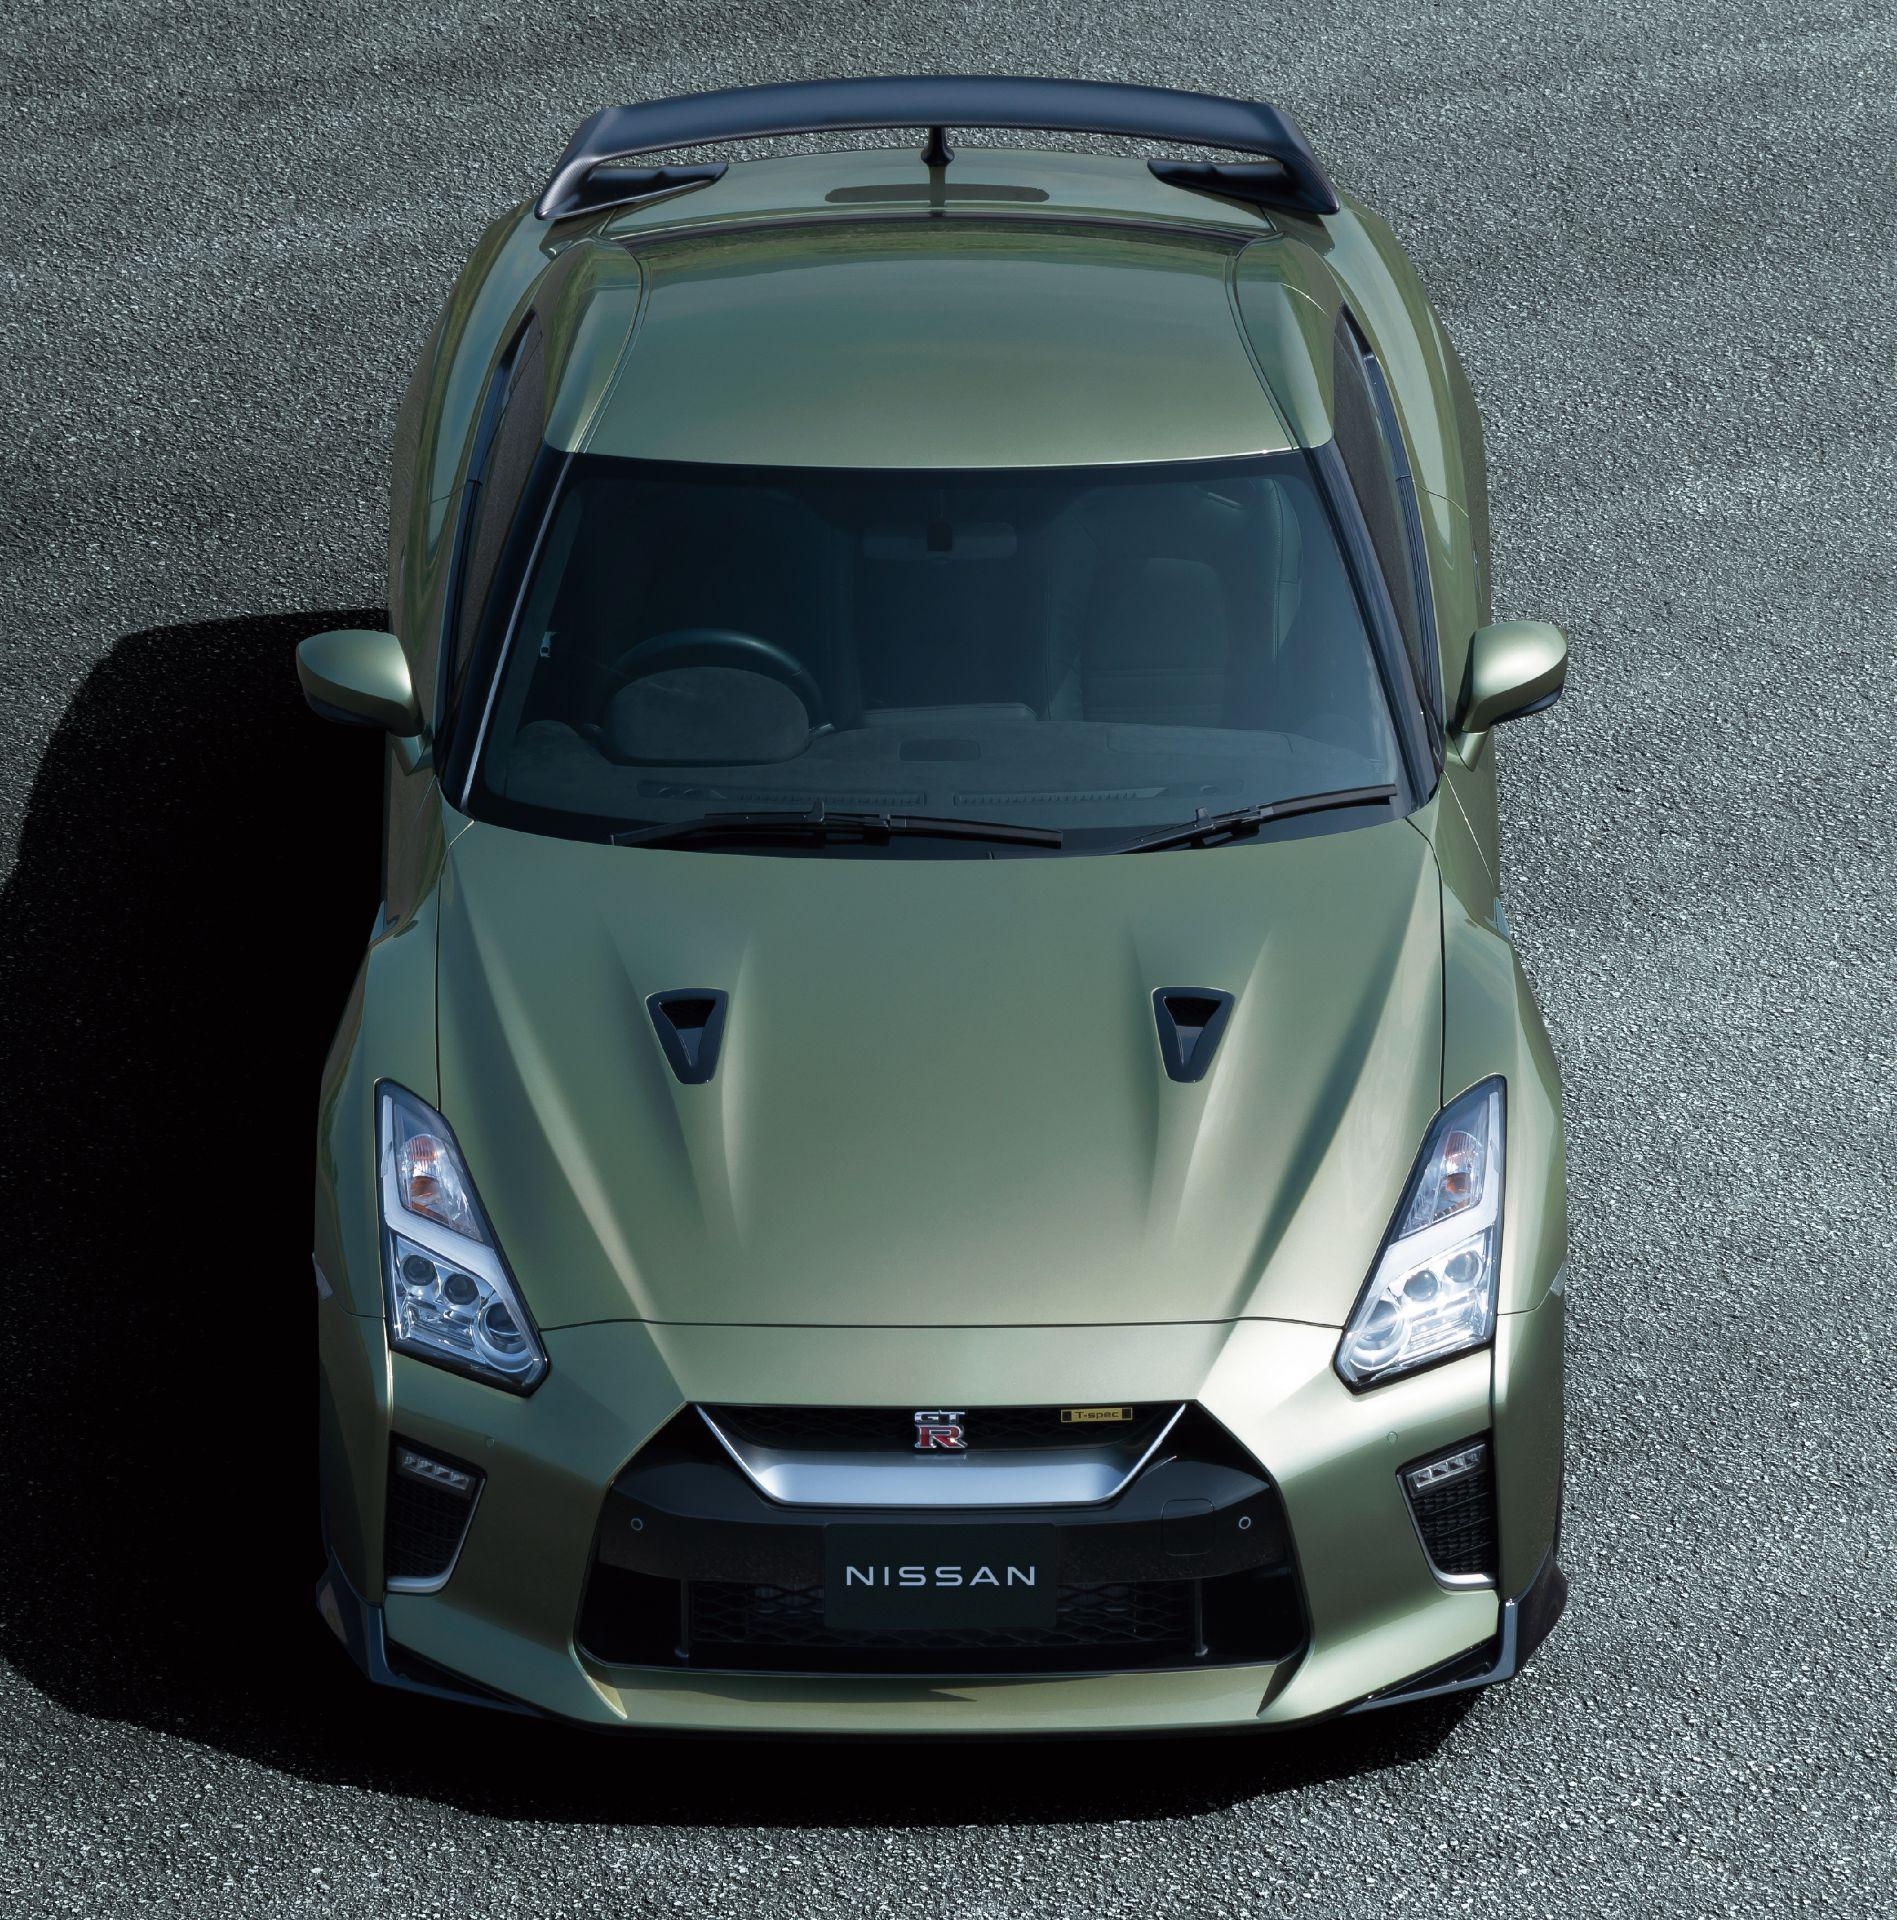 Nissan-GT-R-2021-11